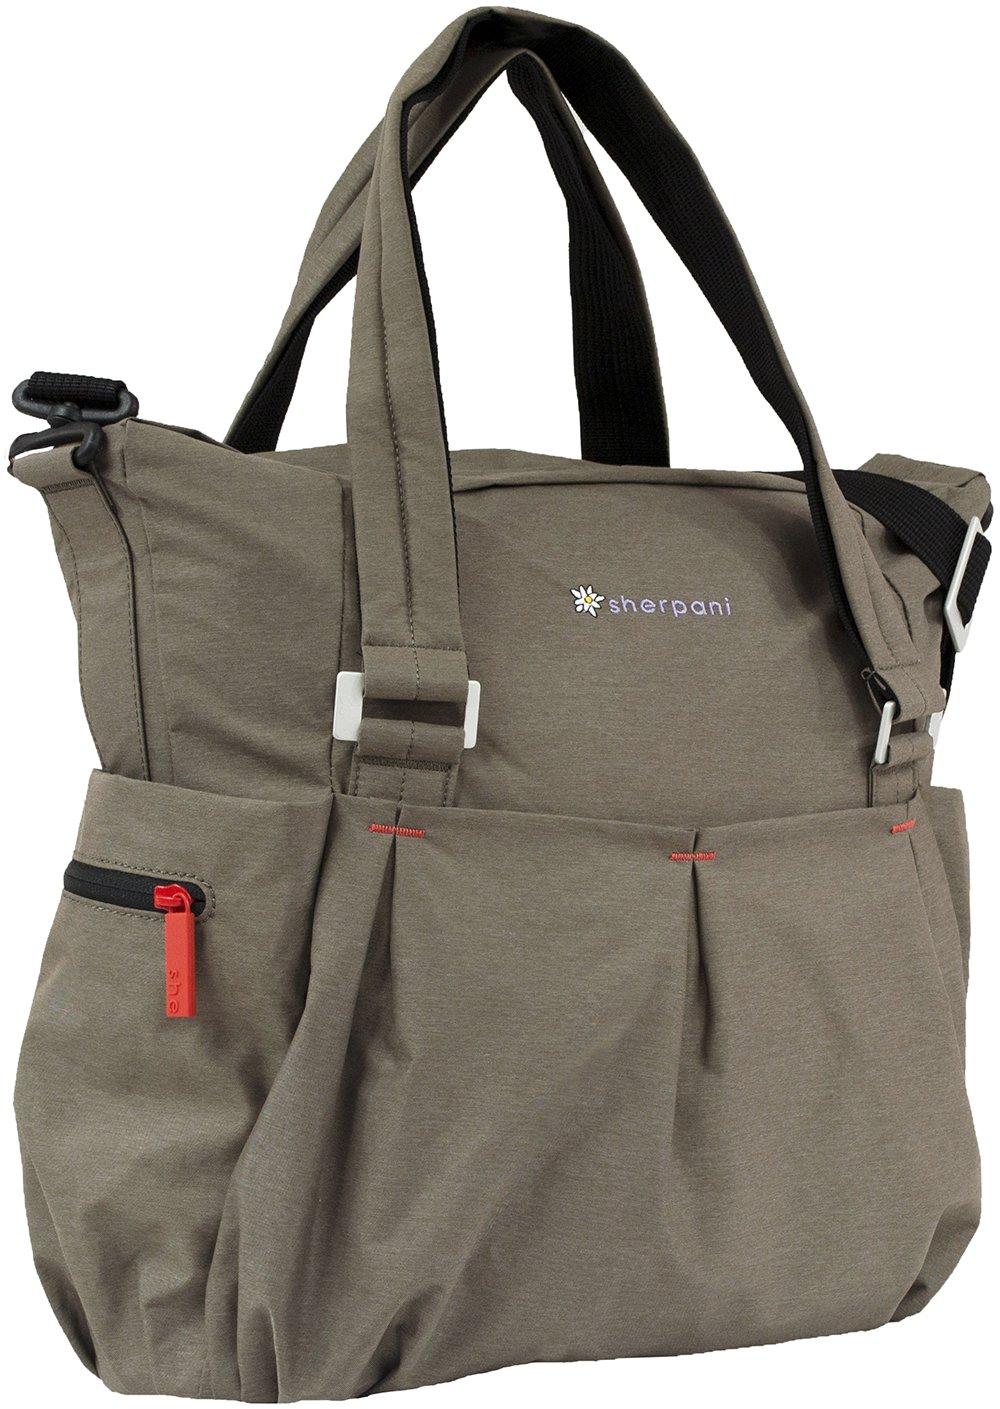 Sherpani Wisdom Yoga Tote Bag Heather Light Brown One Size Amazonca Luggage Bags